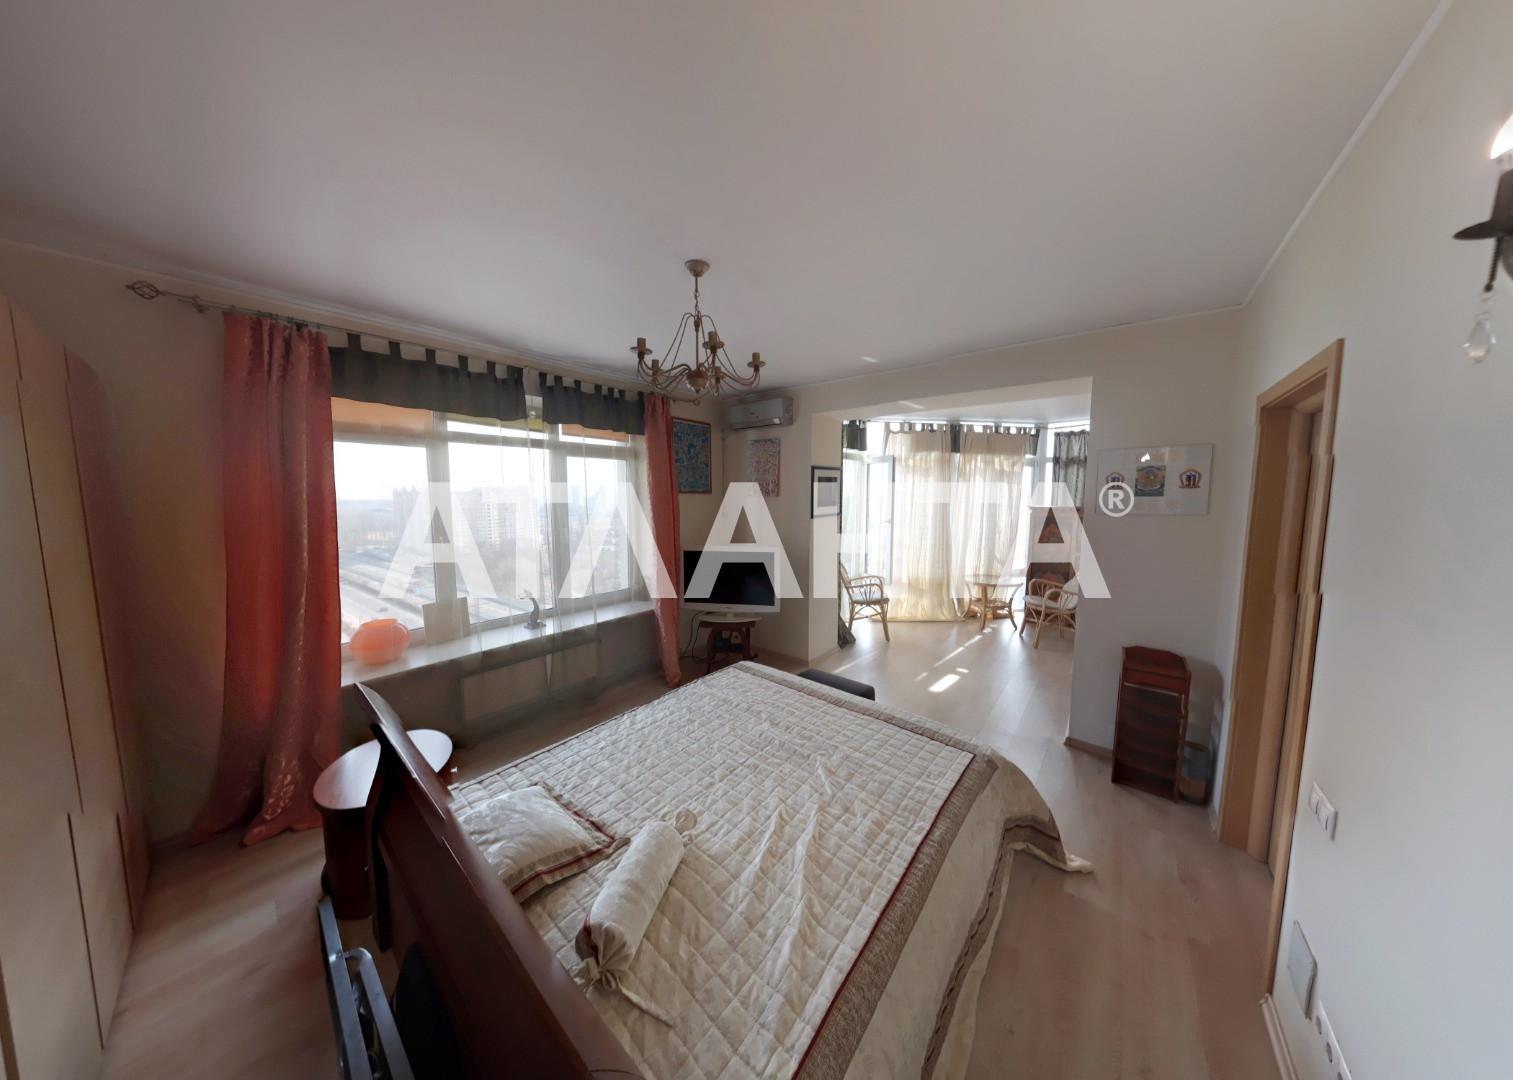 Продается 3-комнатная Квартира на ул. Ломоносова — 118 900 у.е. (фото №2)